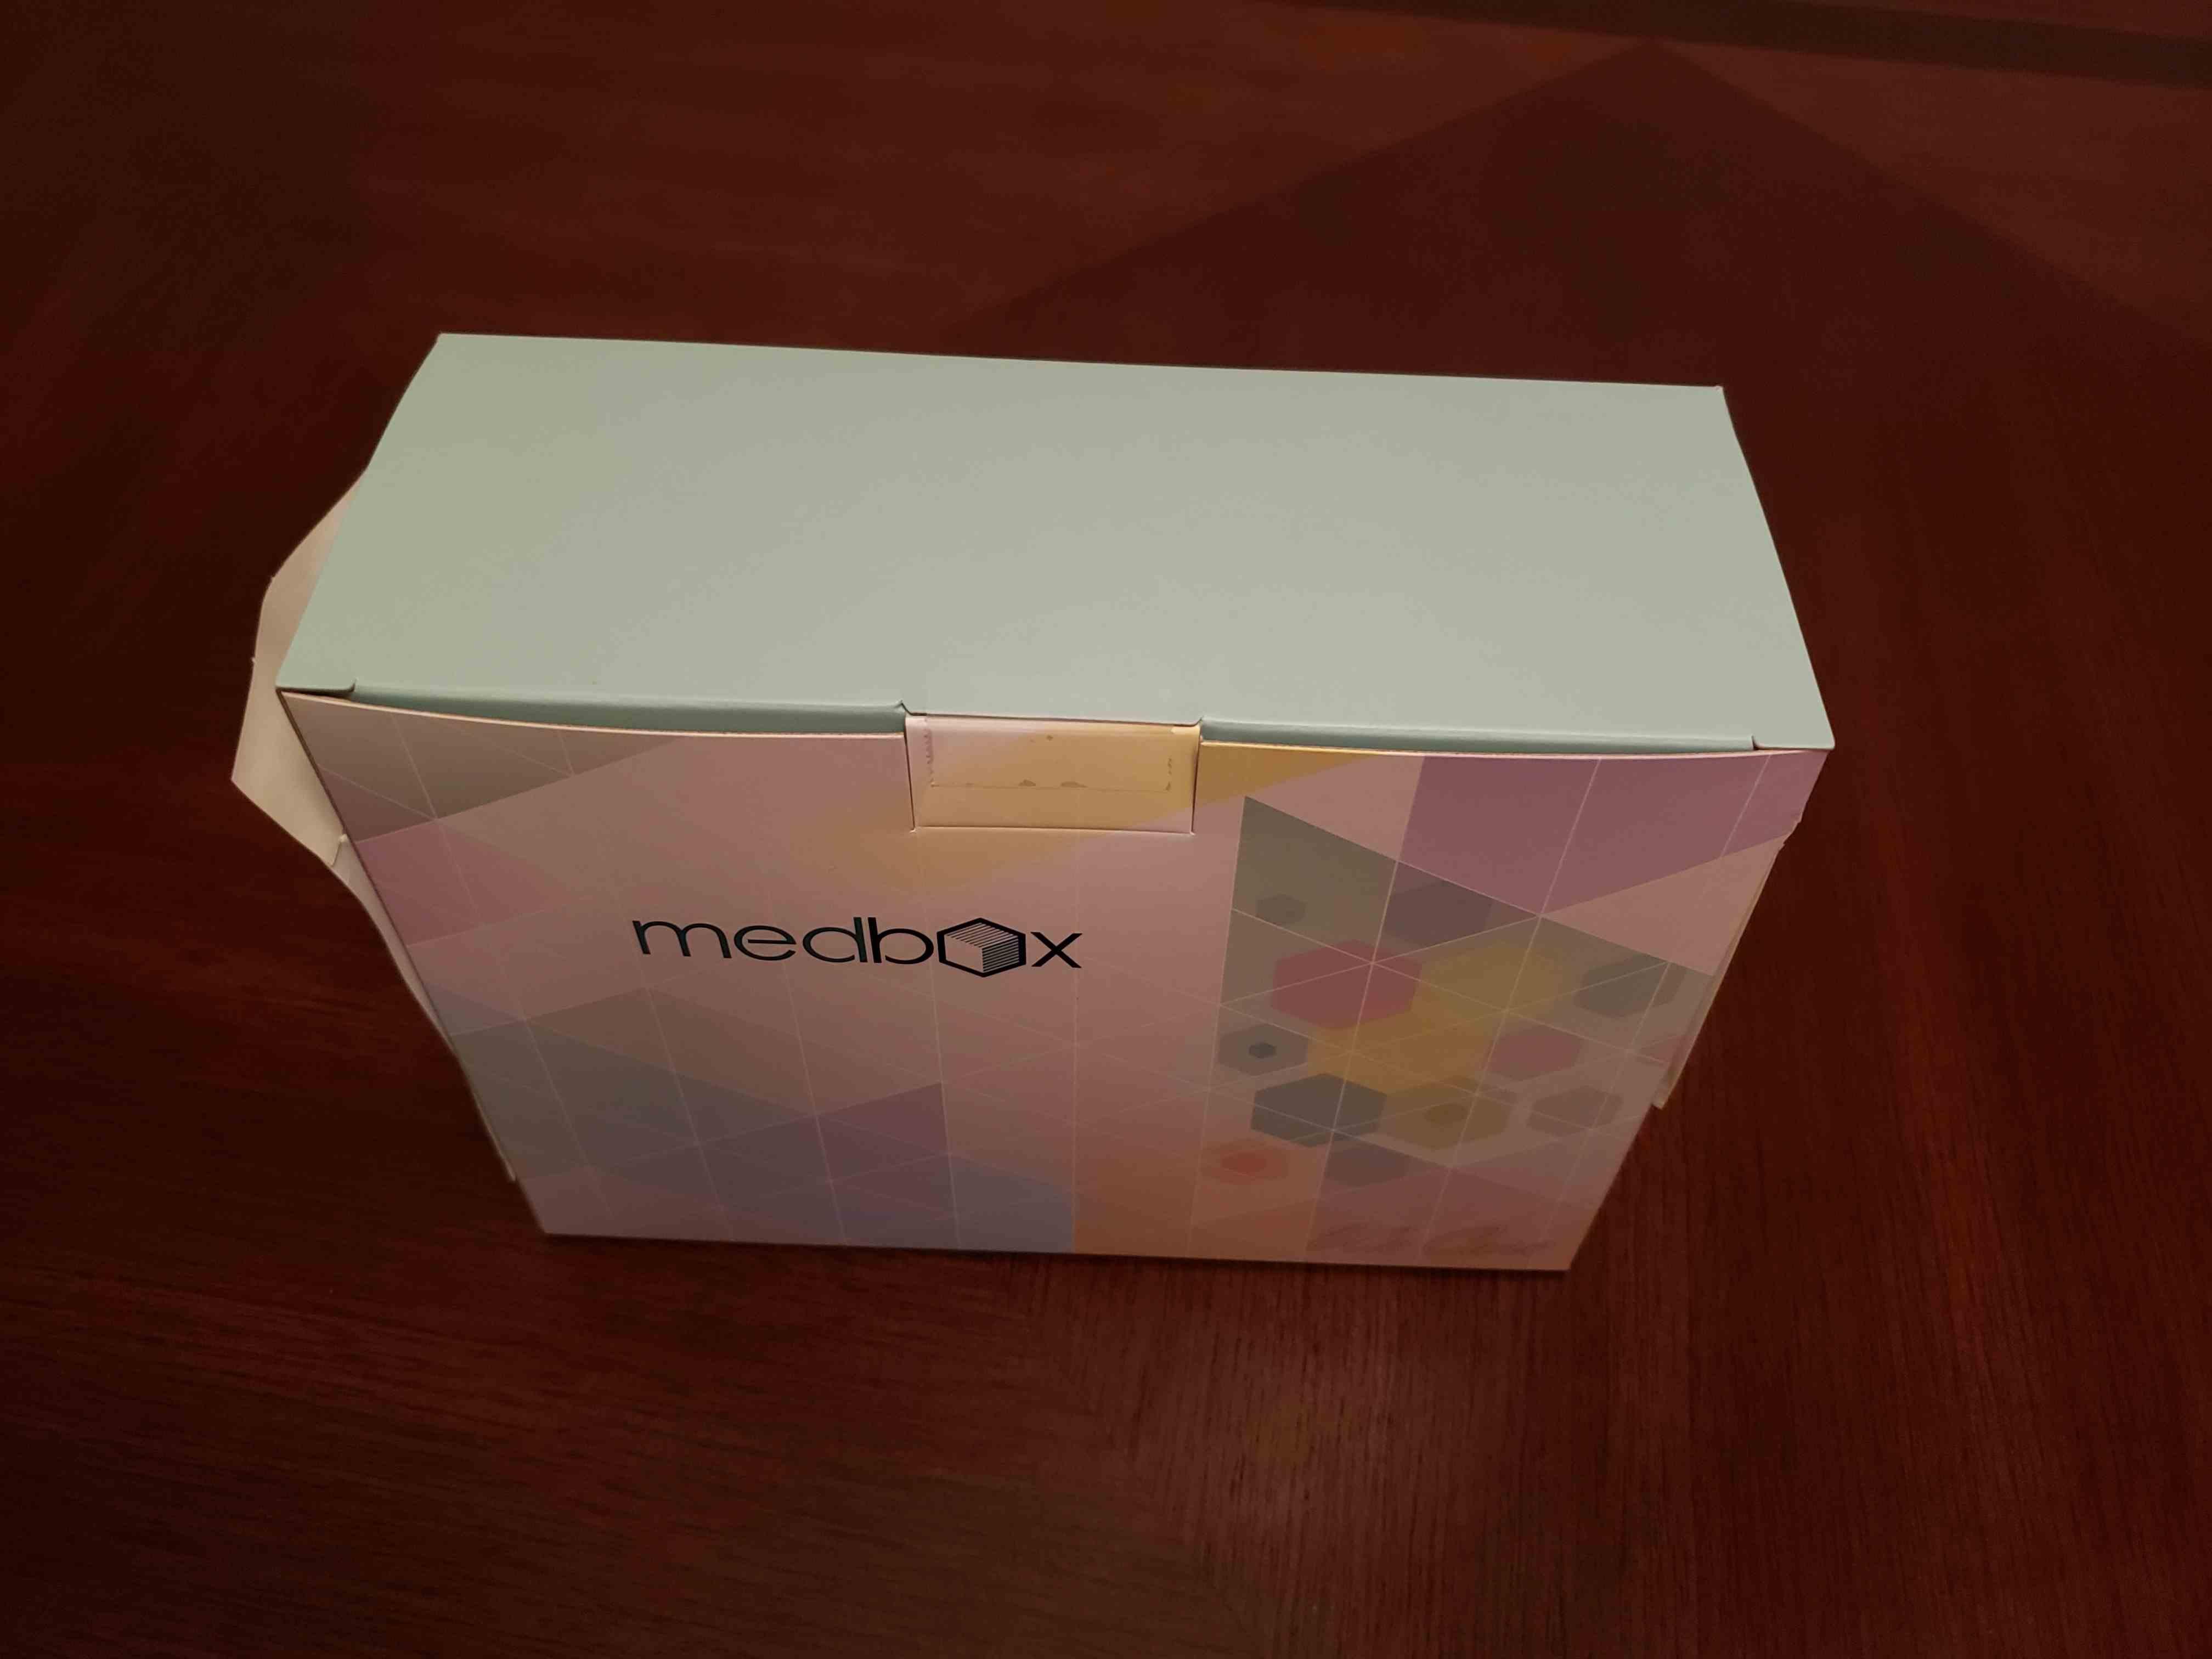 Medbox top